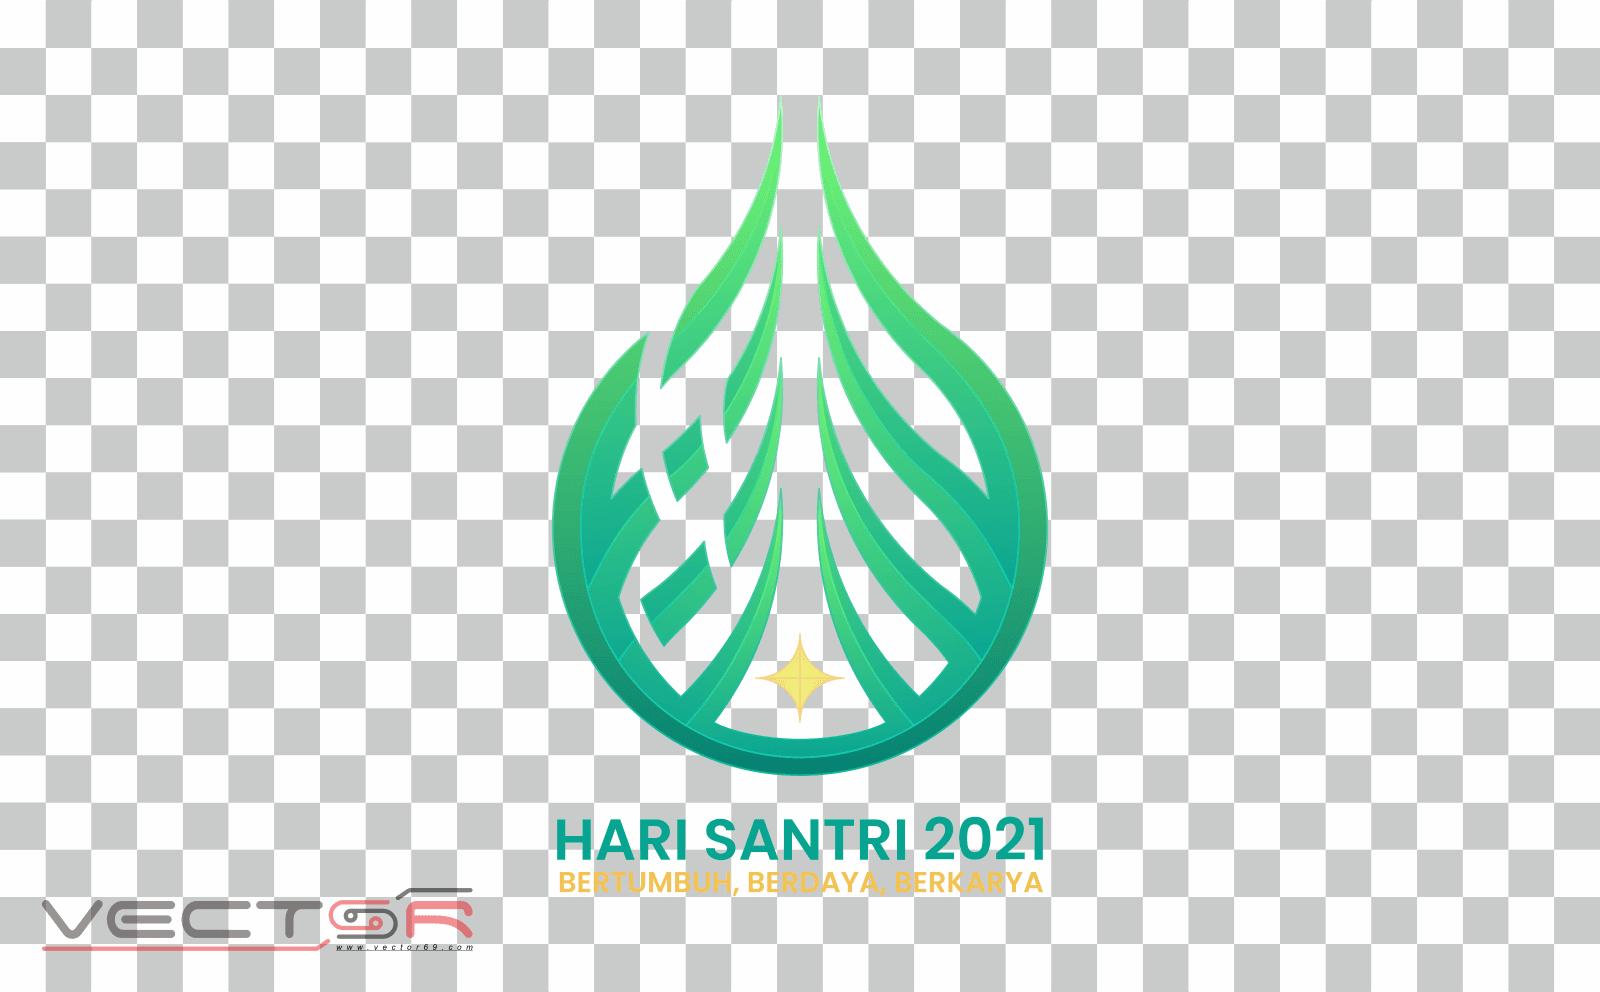 Hari Santri 2021 RMI-NU Logo - Download .PNG (Portable Network Graphics) Transparent Images